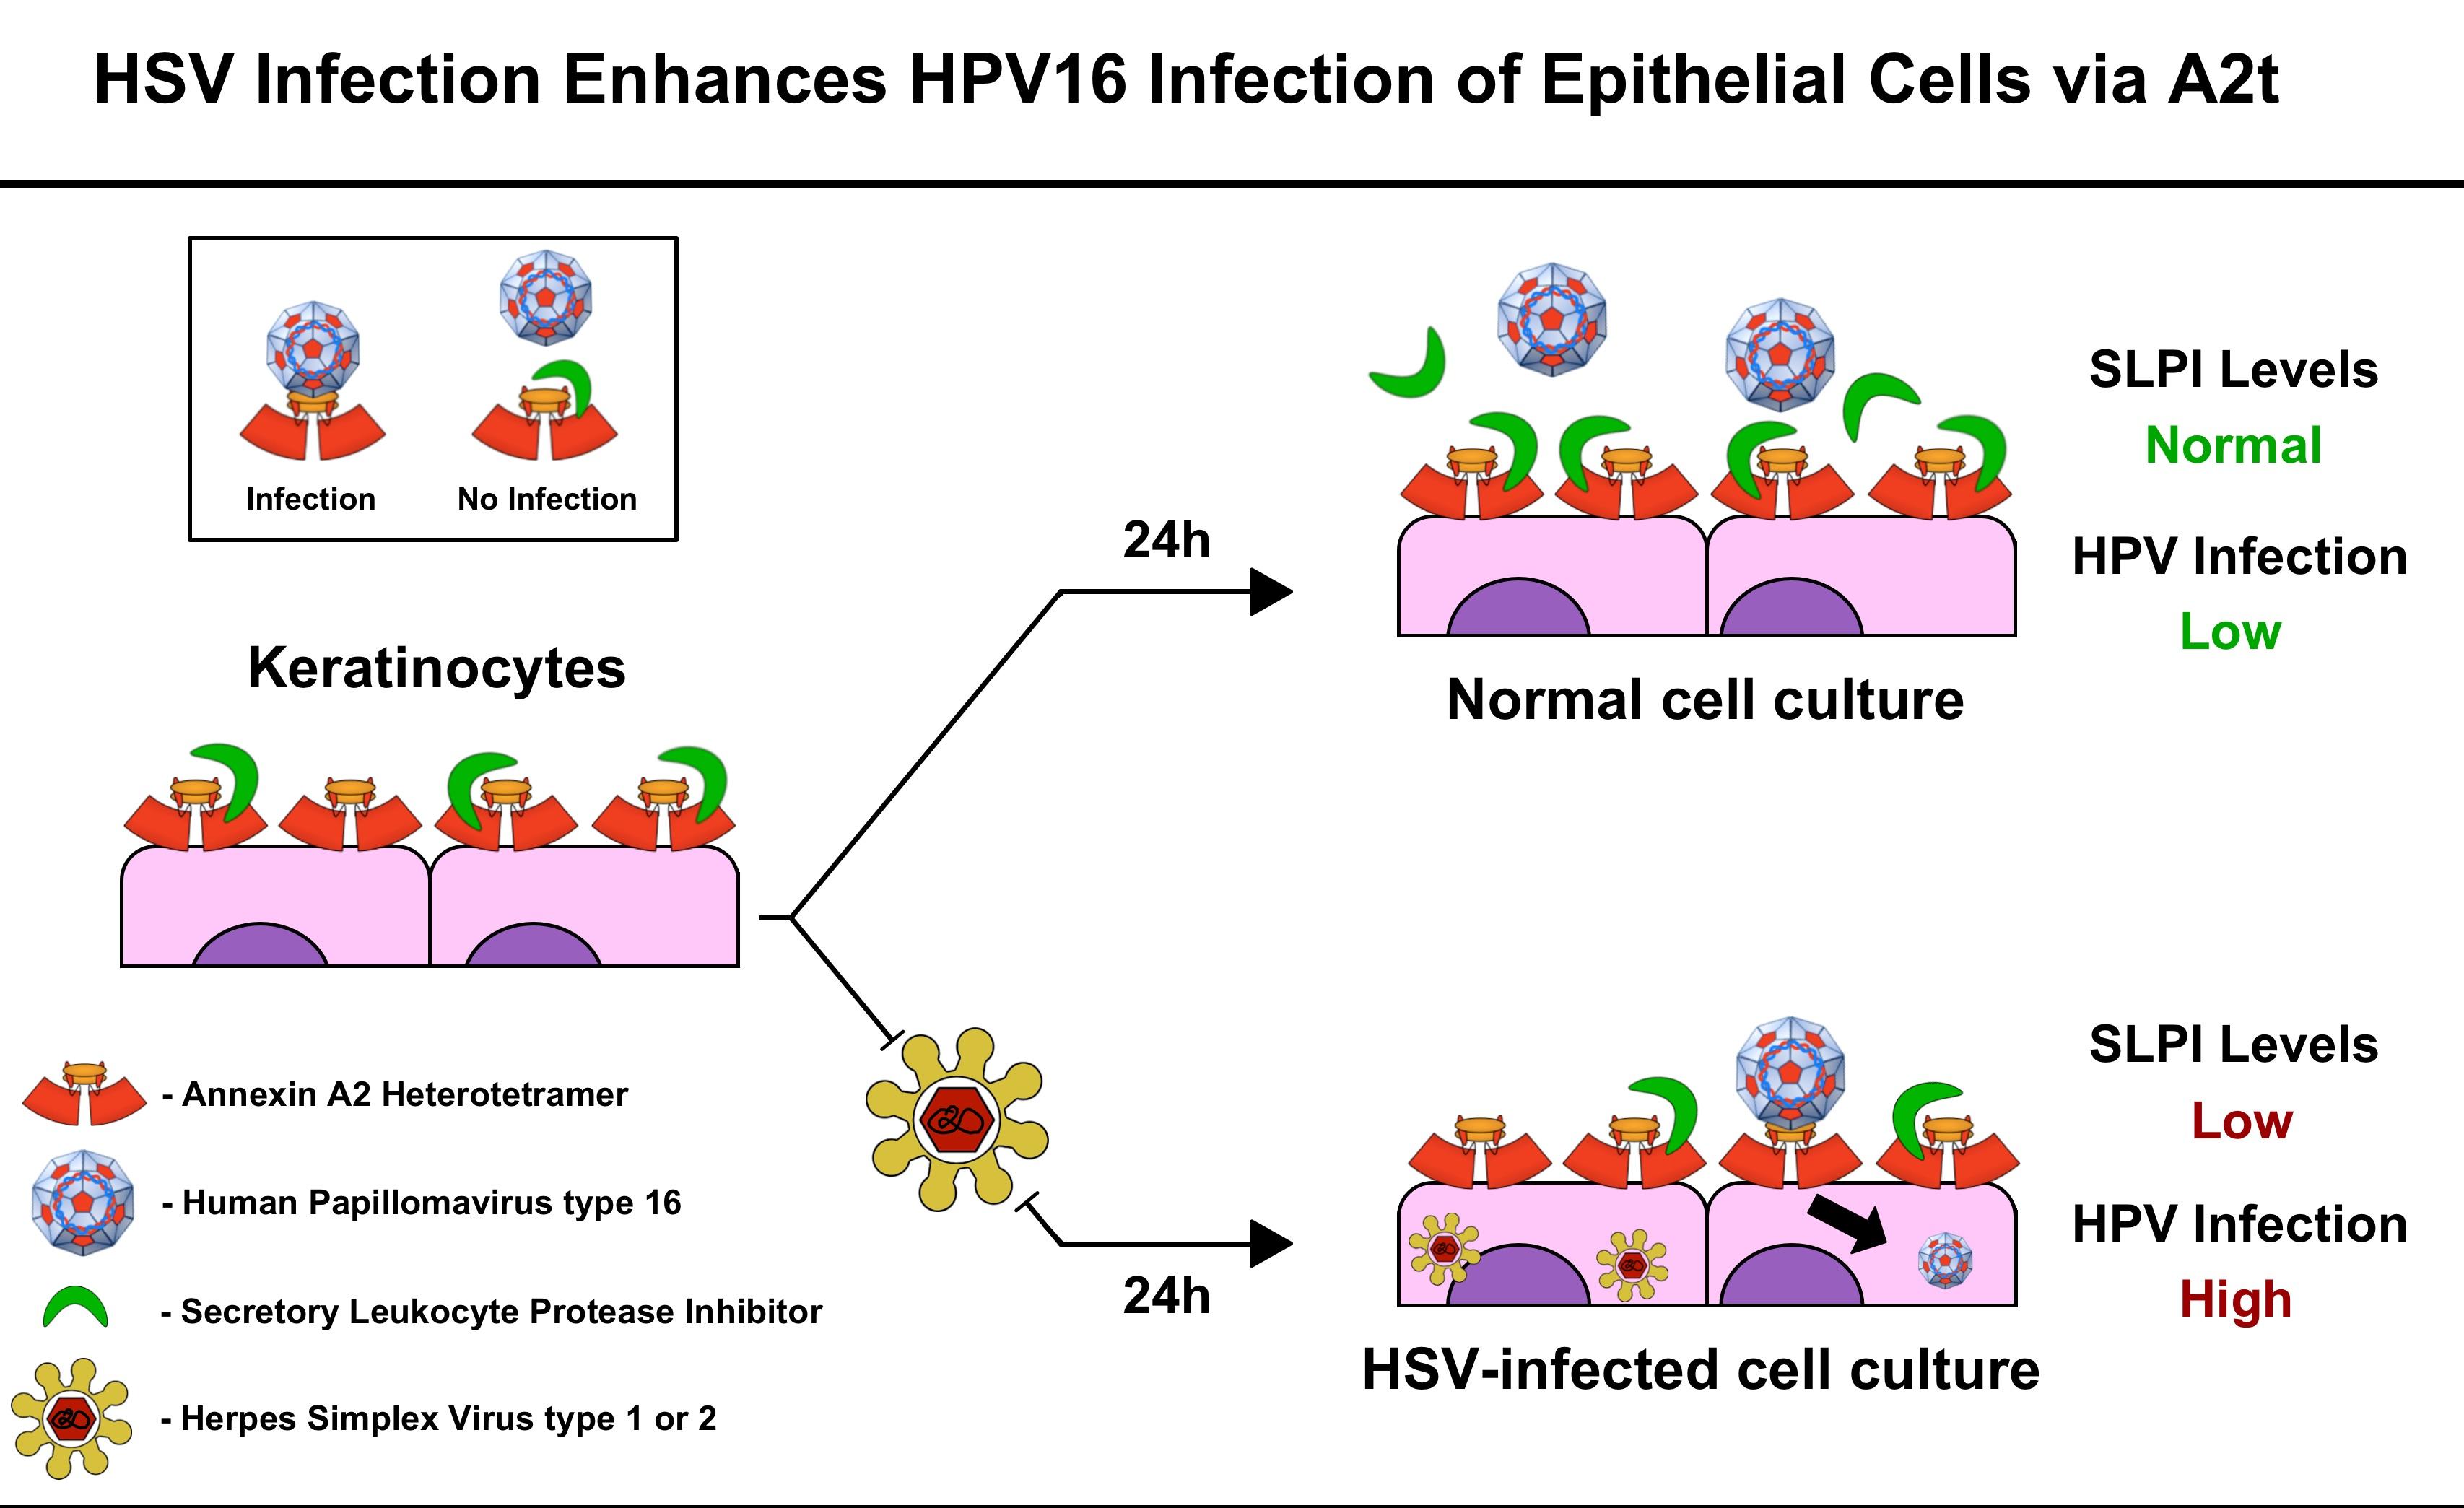 Hpv virus same as herpes